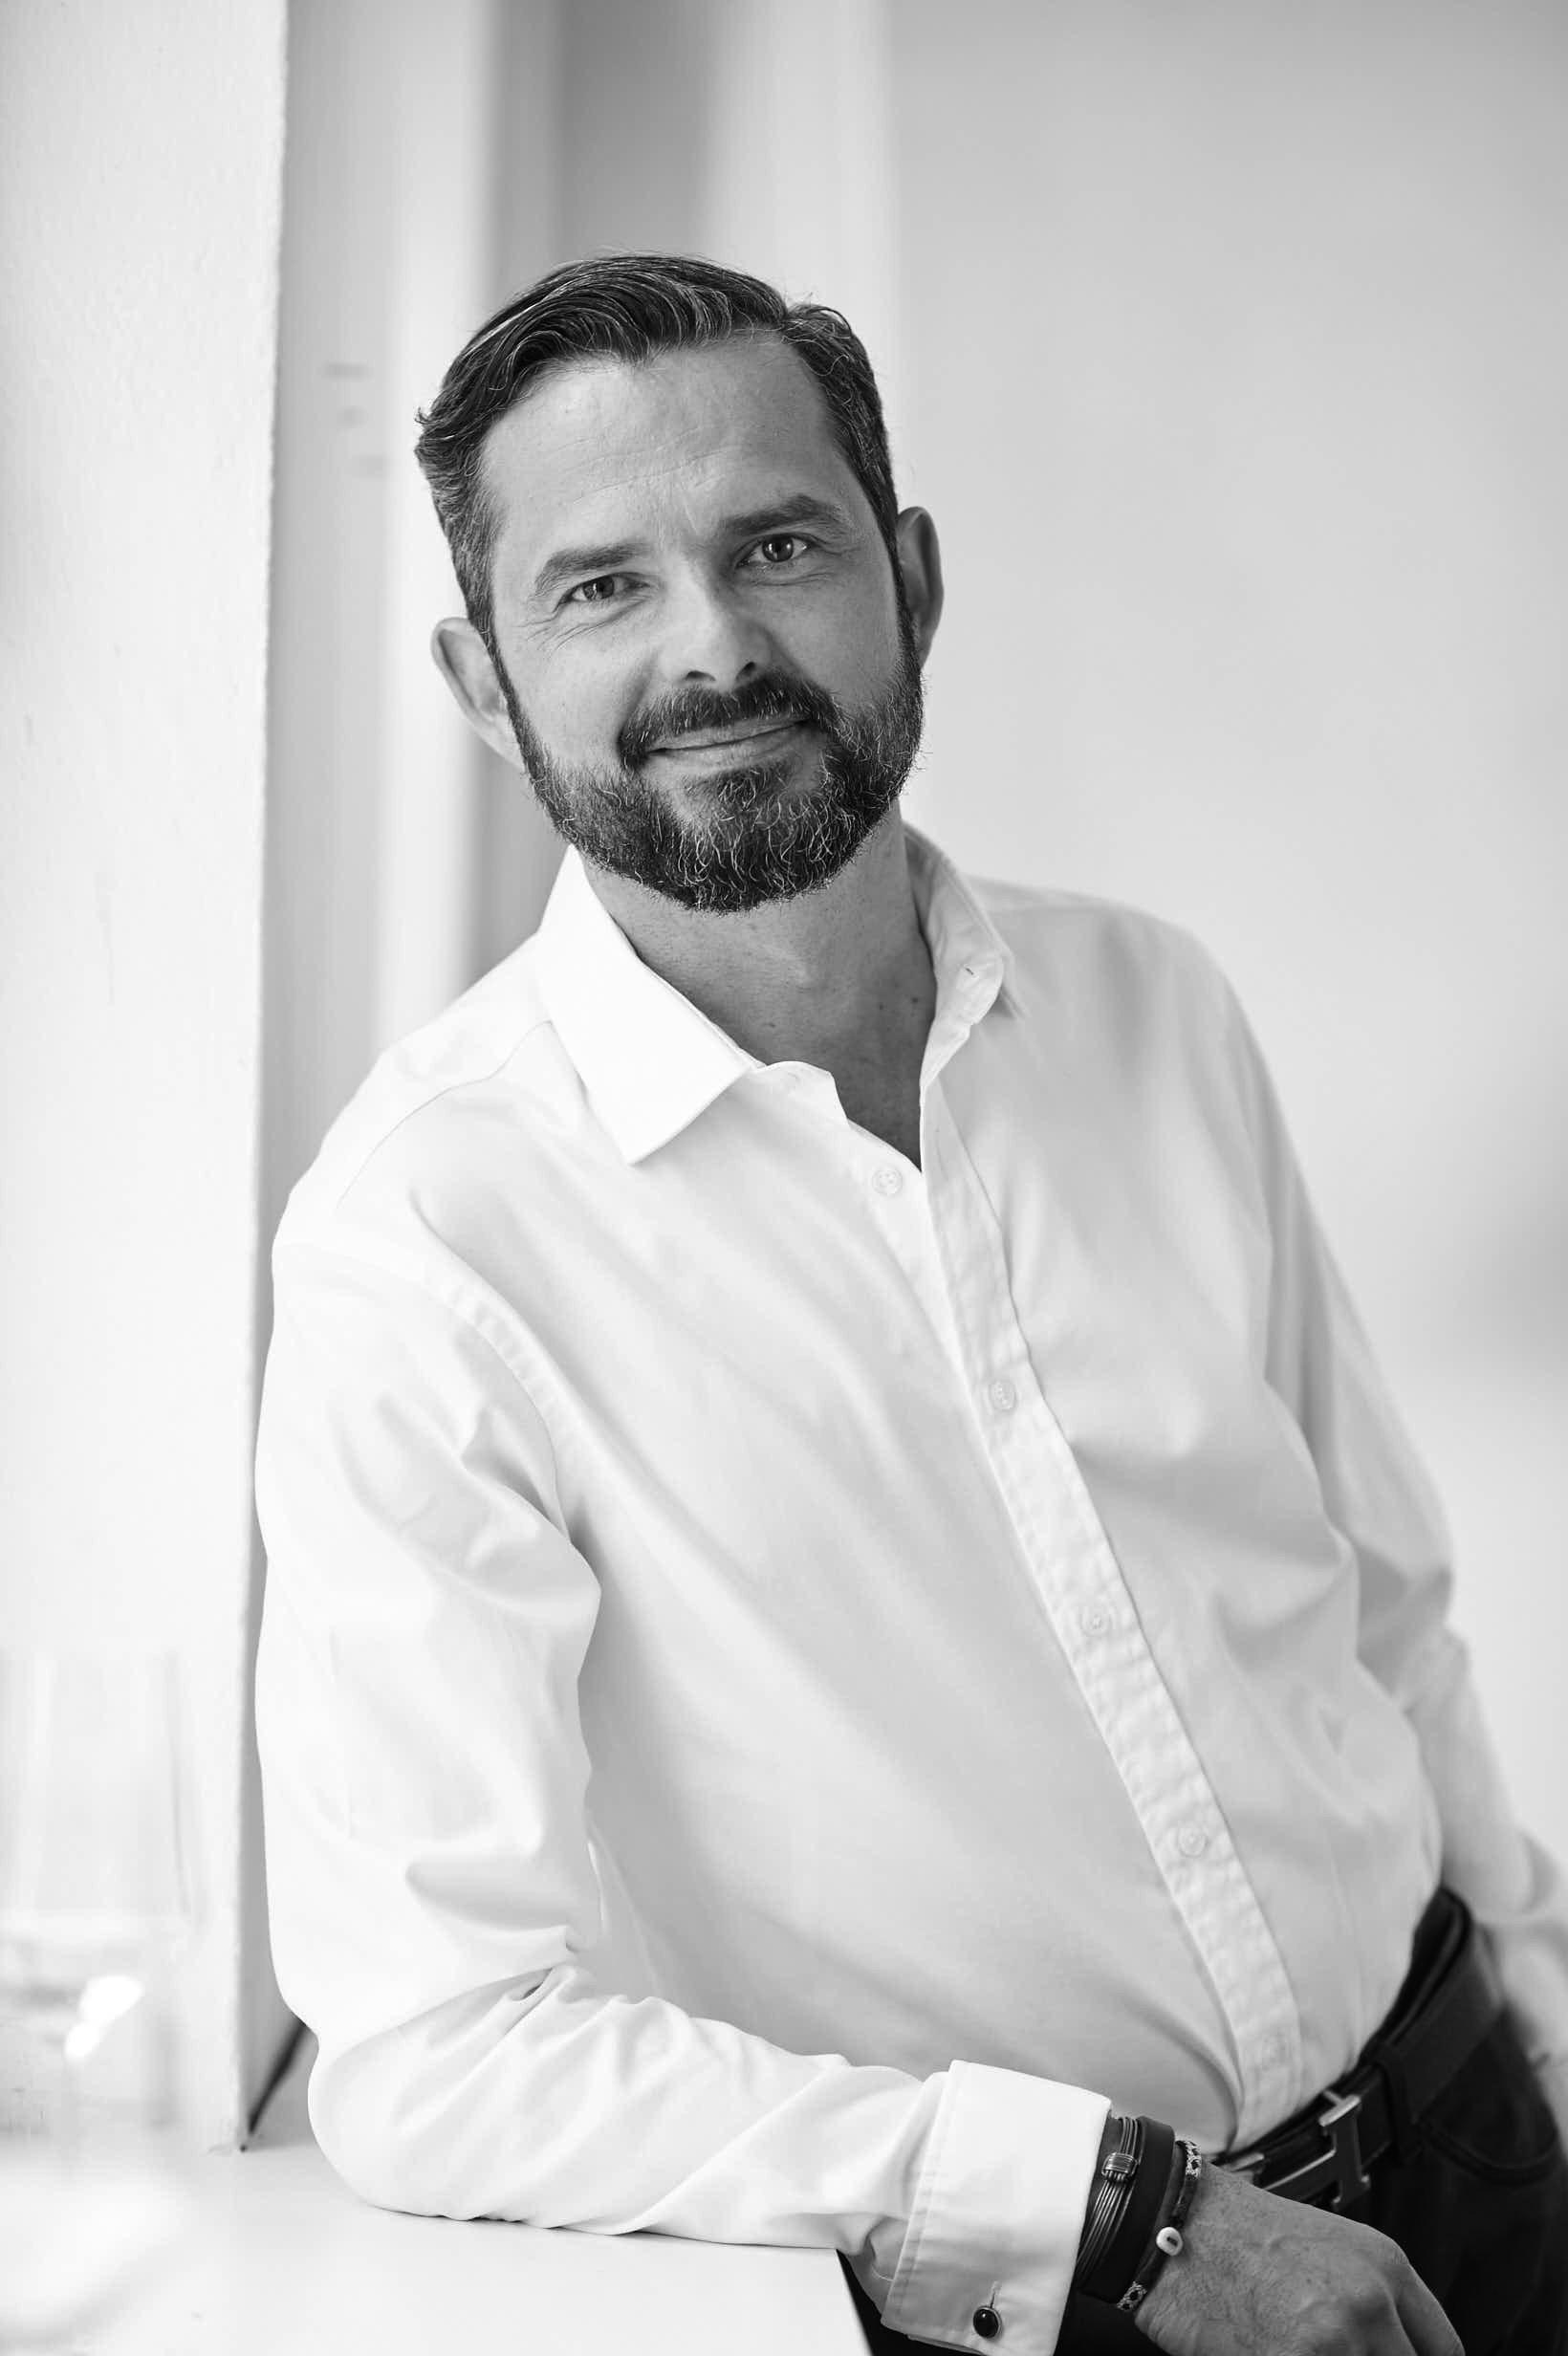 Nikolas von Haugwitz, Verkställande direktörer, The Wine Company